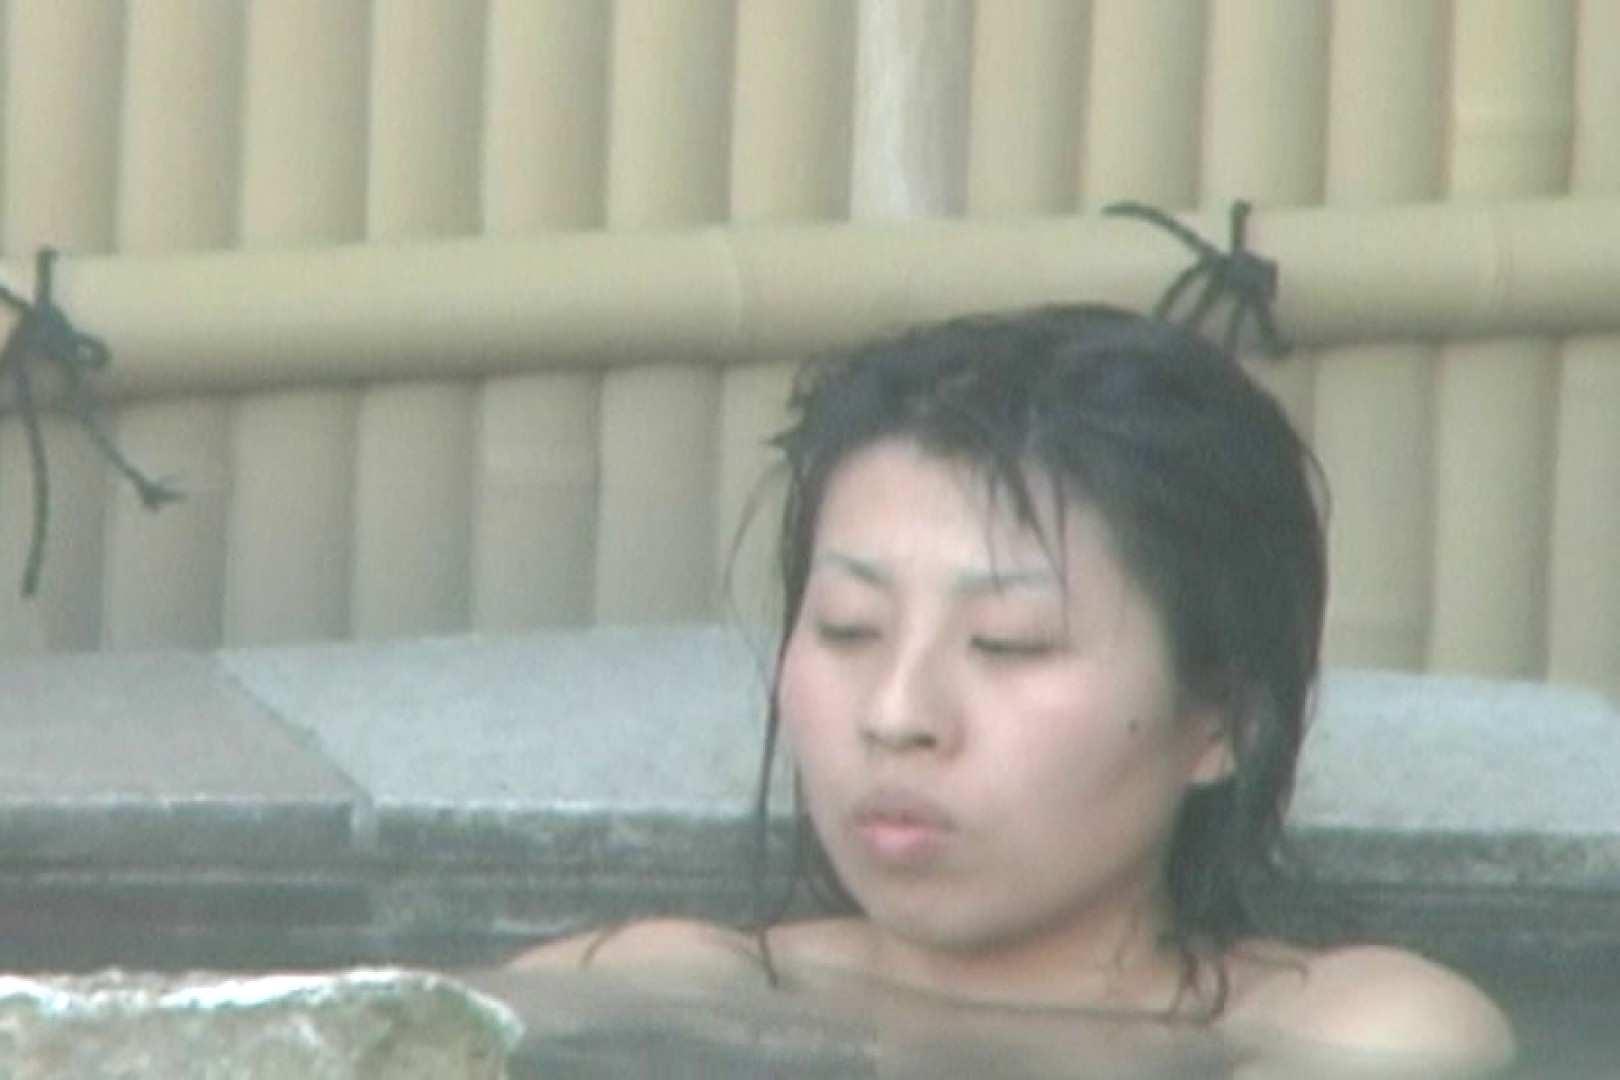 Aquaな露天風呂Vol.589 盗撮 | HなOL  105pic 51